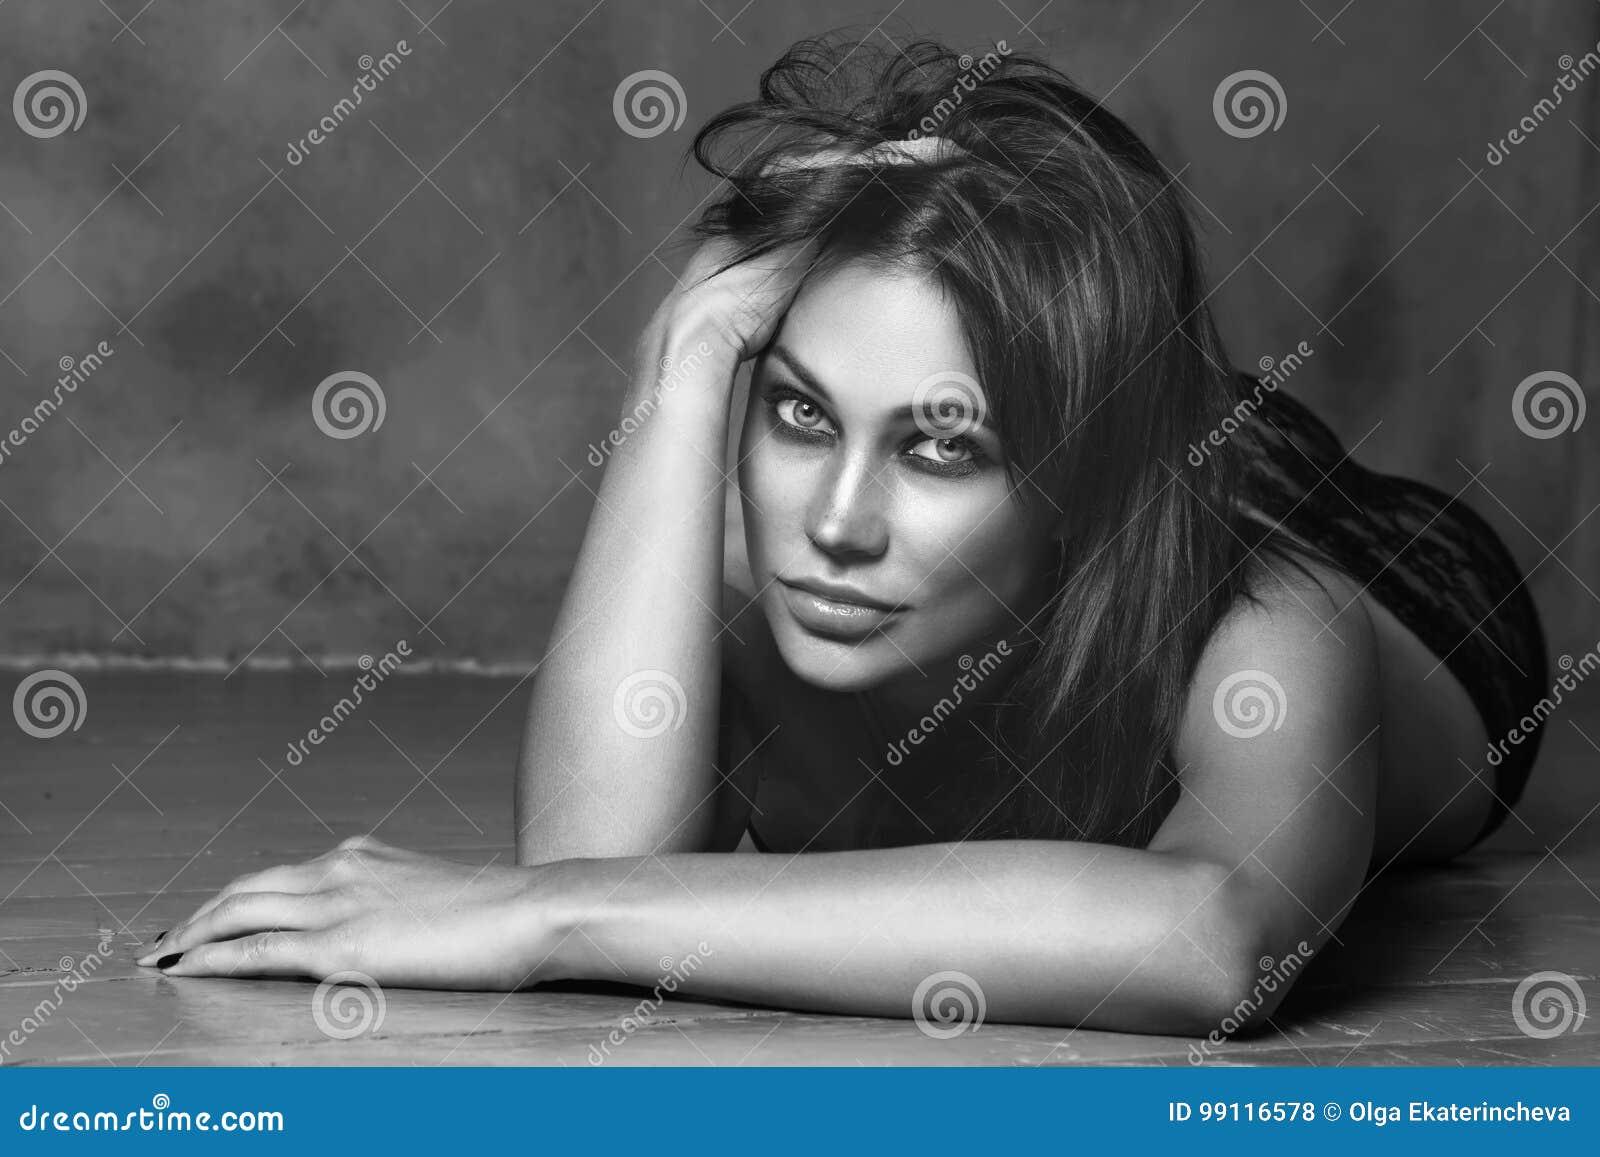 O estilo preto e branco do vintage disparou da mulher  sexy  bonita